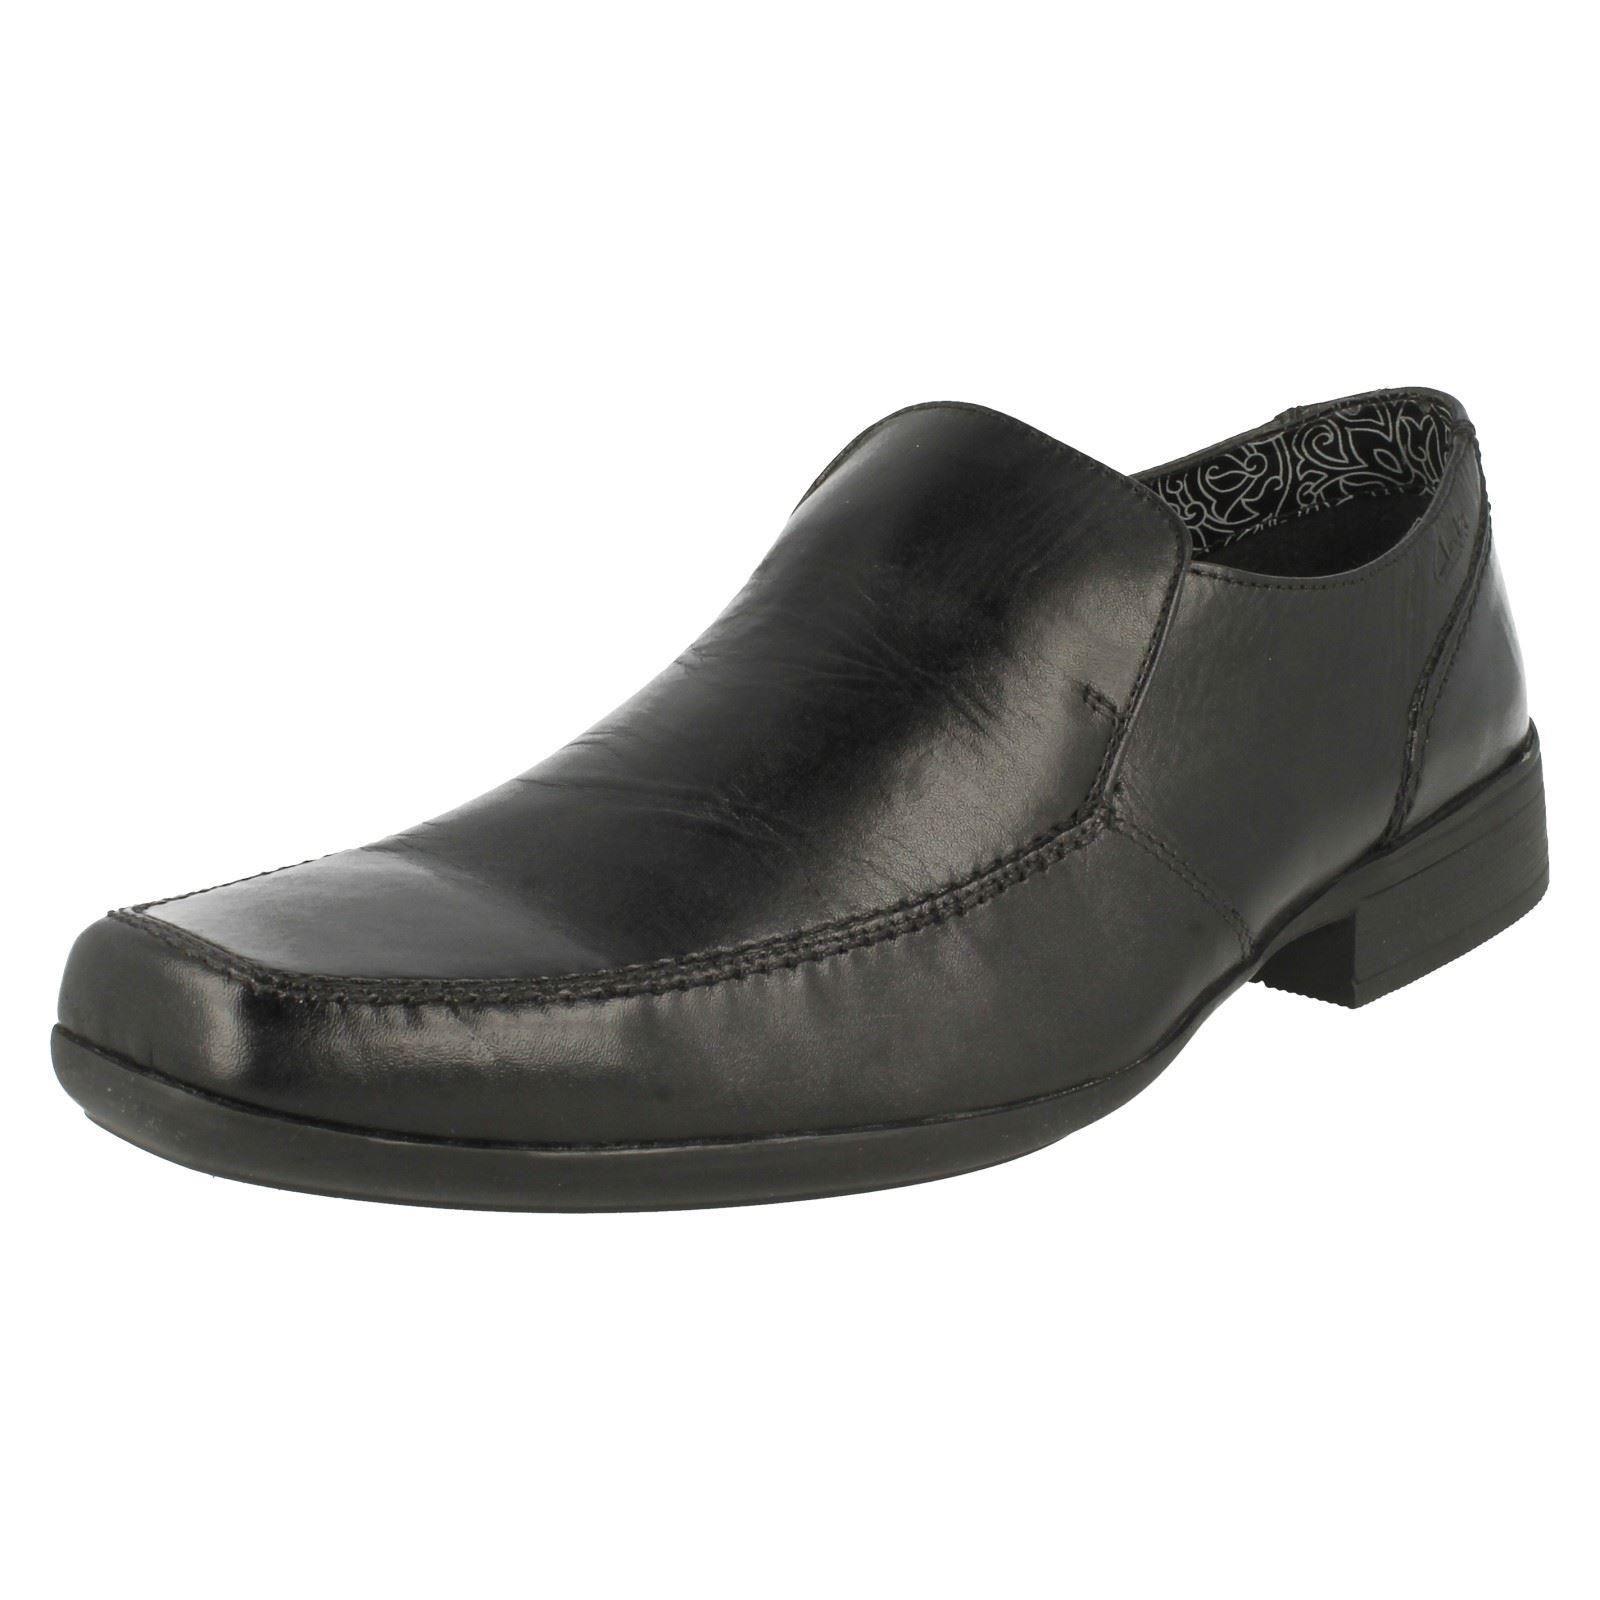 Mens Clarks Smart Slip On Smart Clarks Shoes Aze Night 644d47